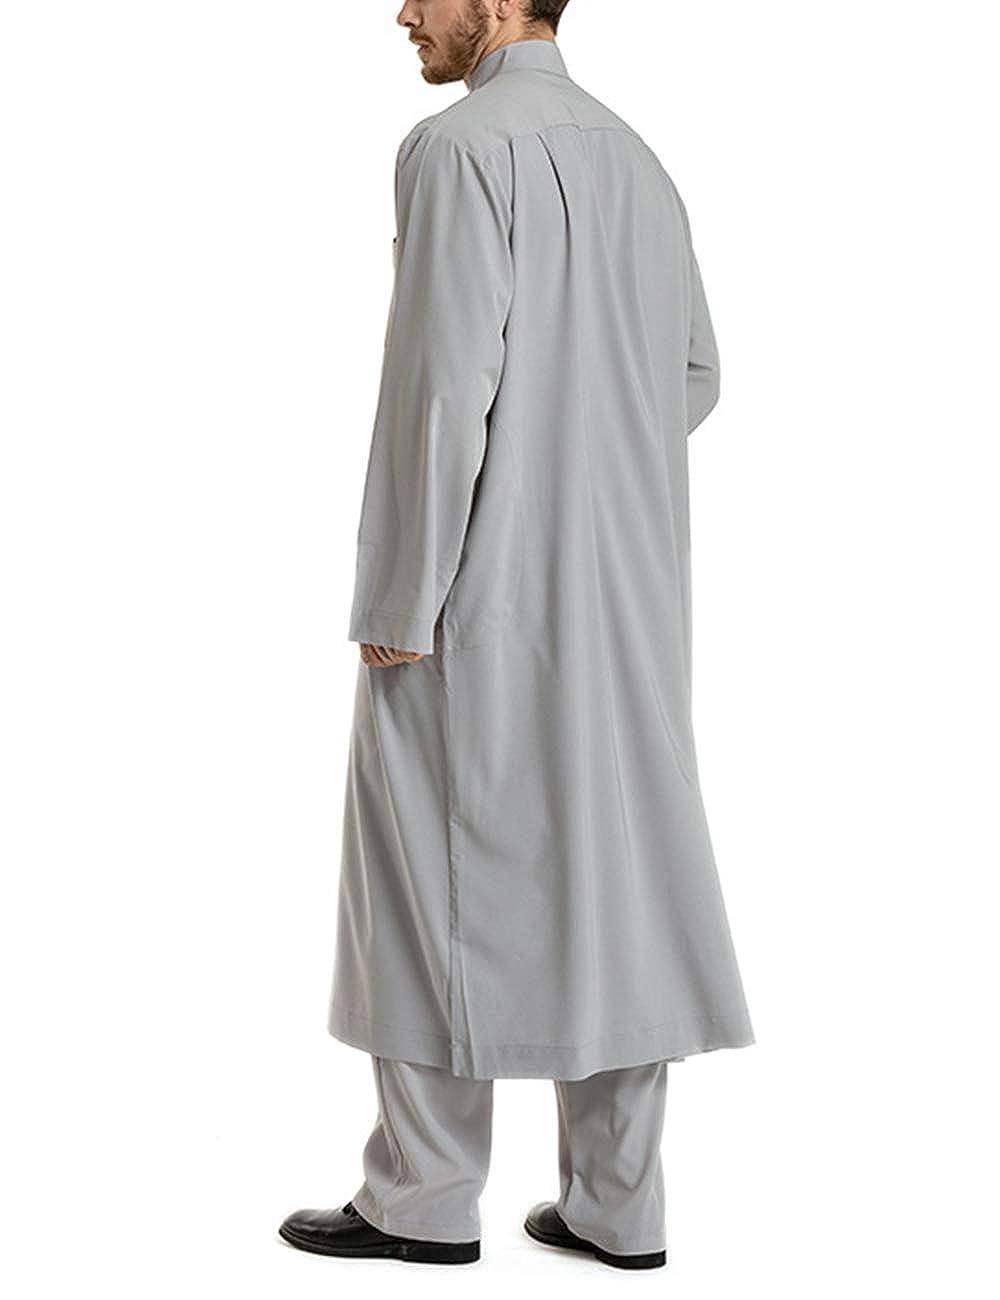 Amazon.com: besbomig - Albornoz para hombre Thobe Arab ...